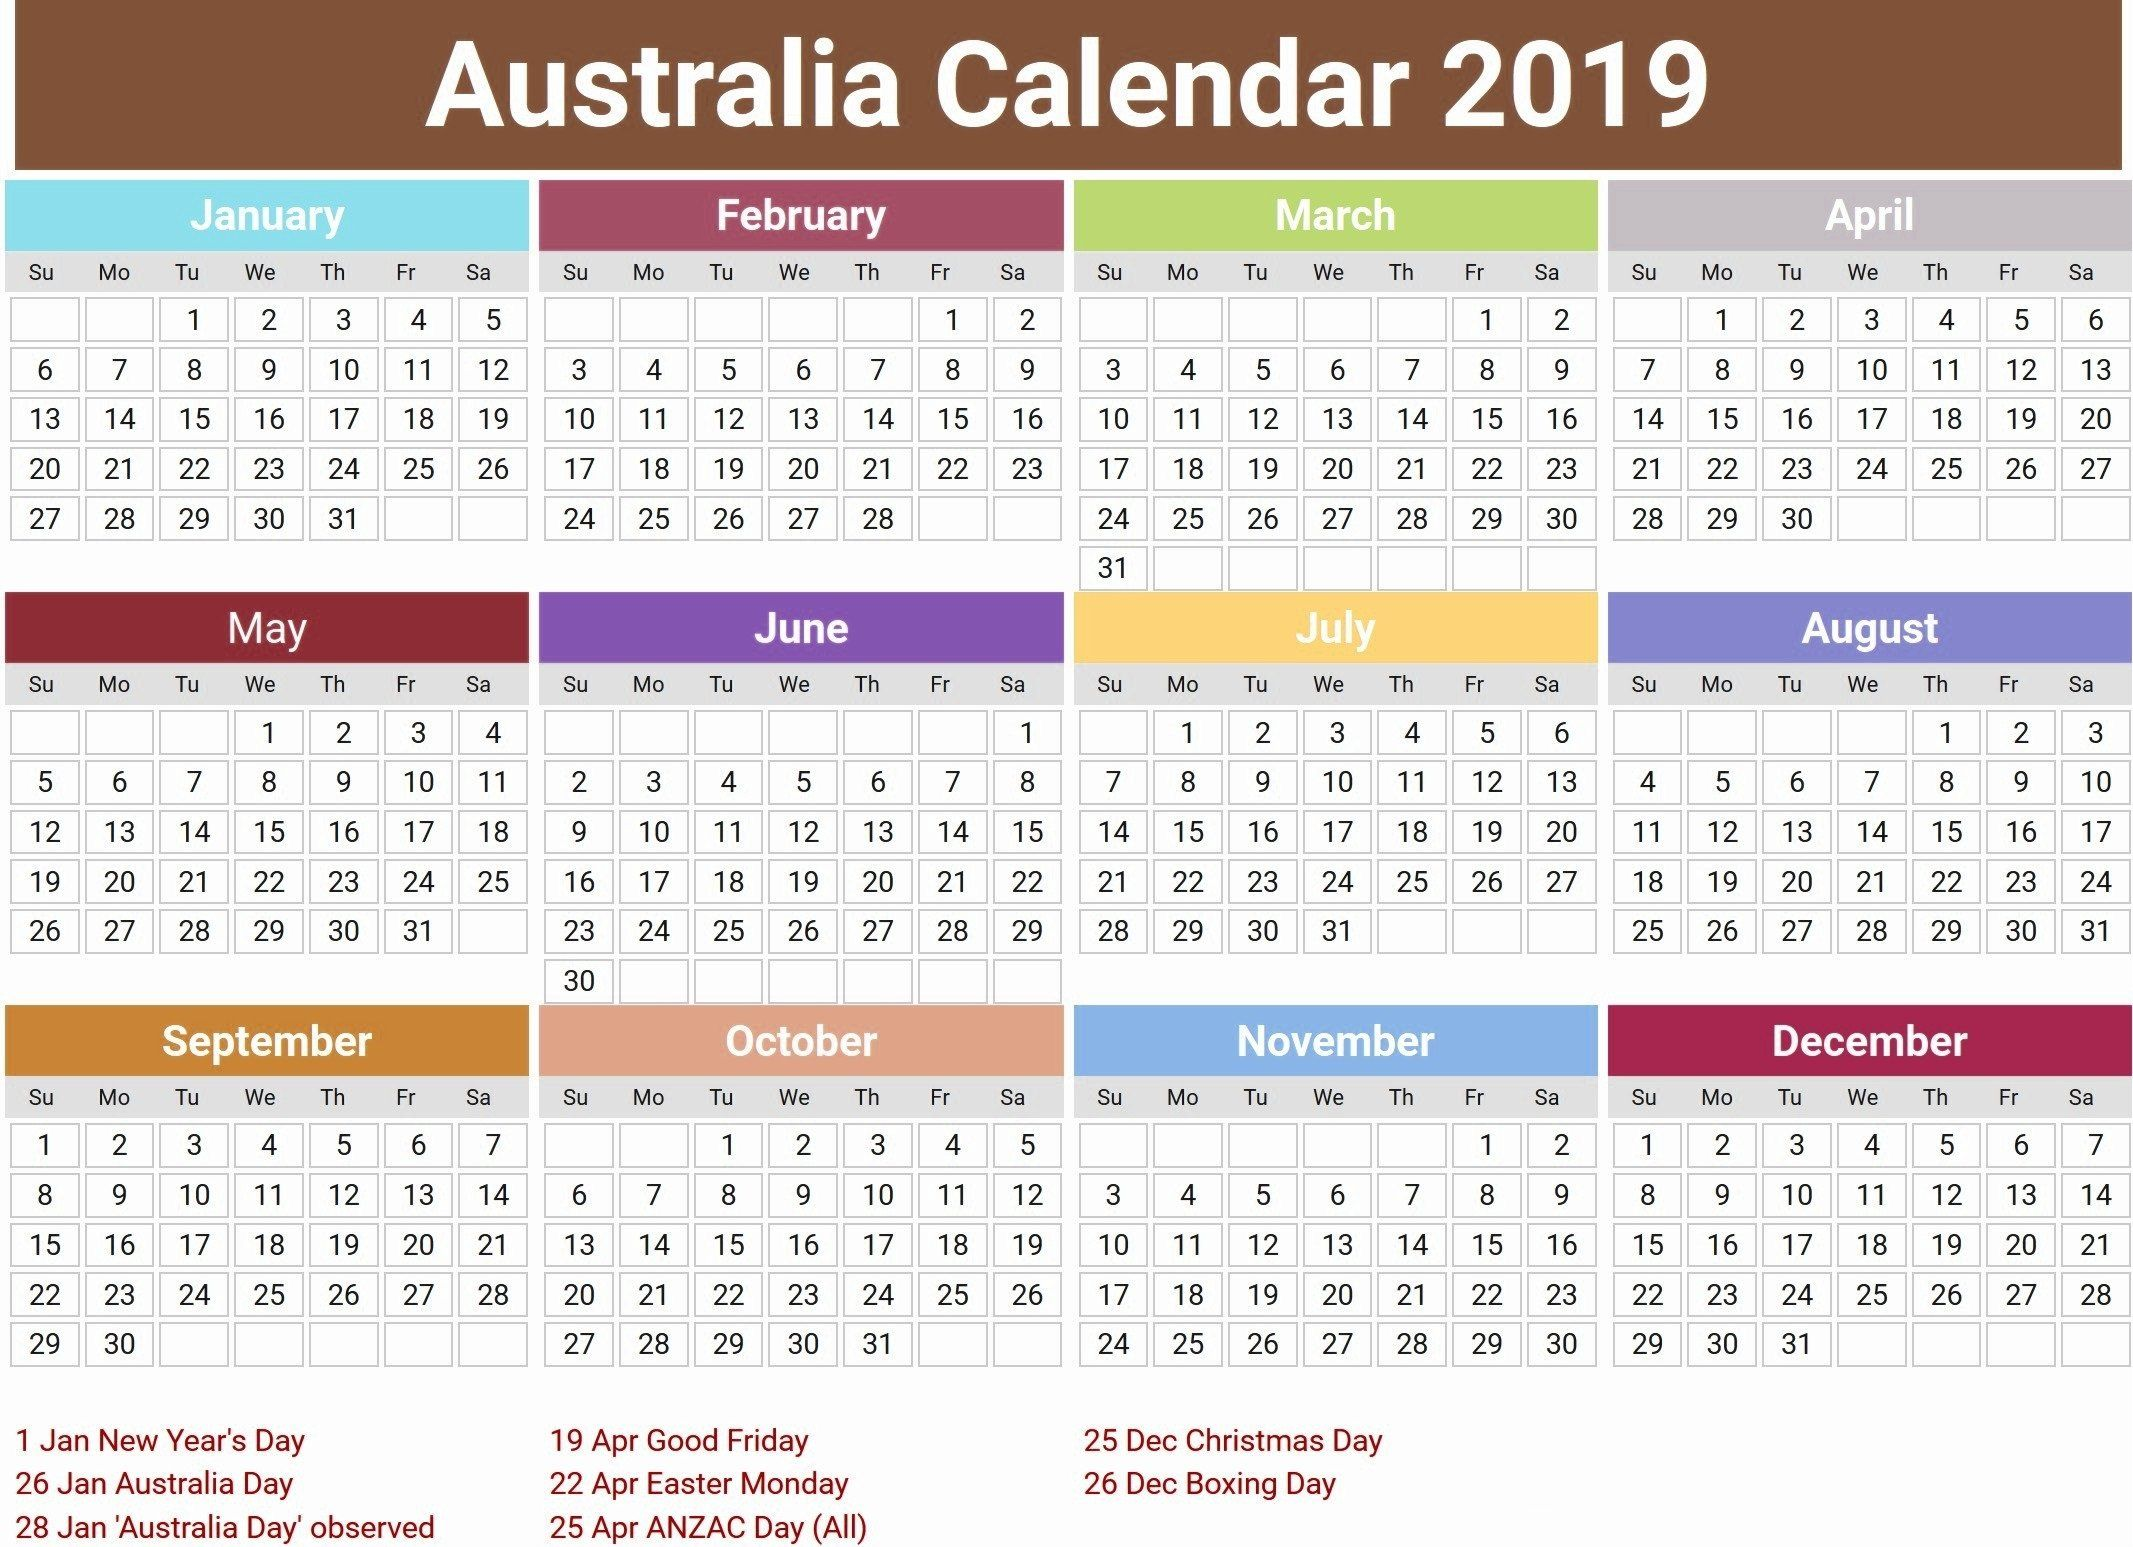 Australian 2019 Calendar australia 2019 calendar with holidays | Printable Calendar 2019